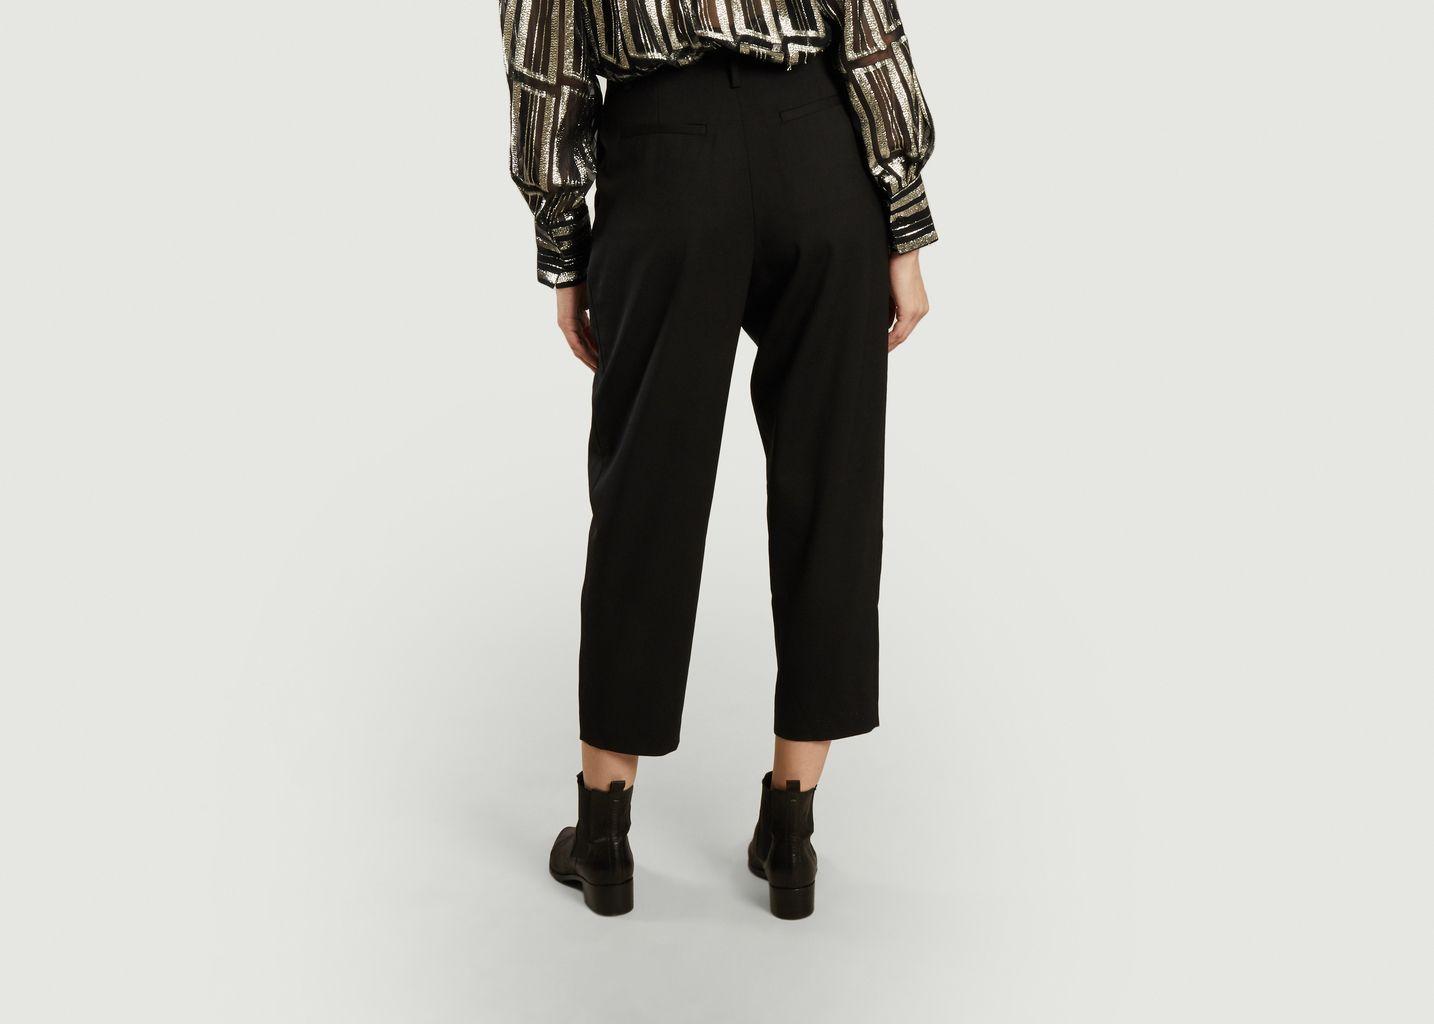 Pantalon Alesso - IRO